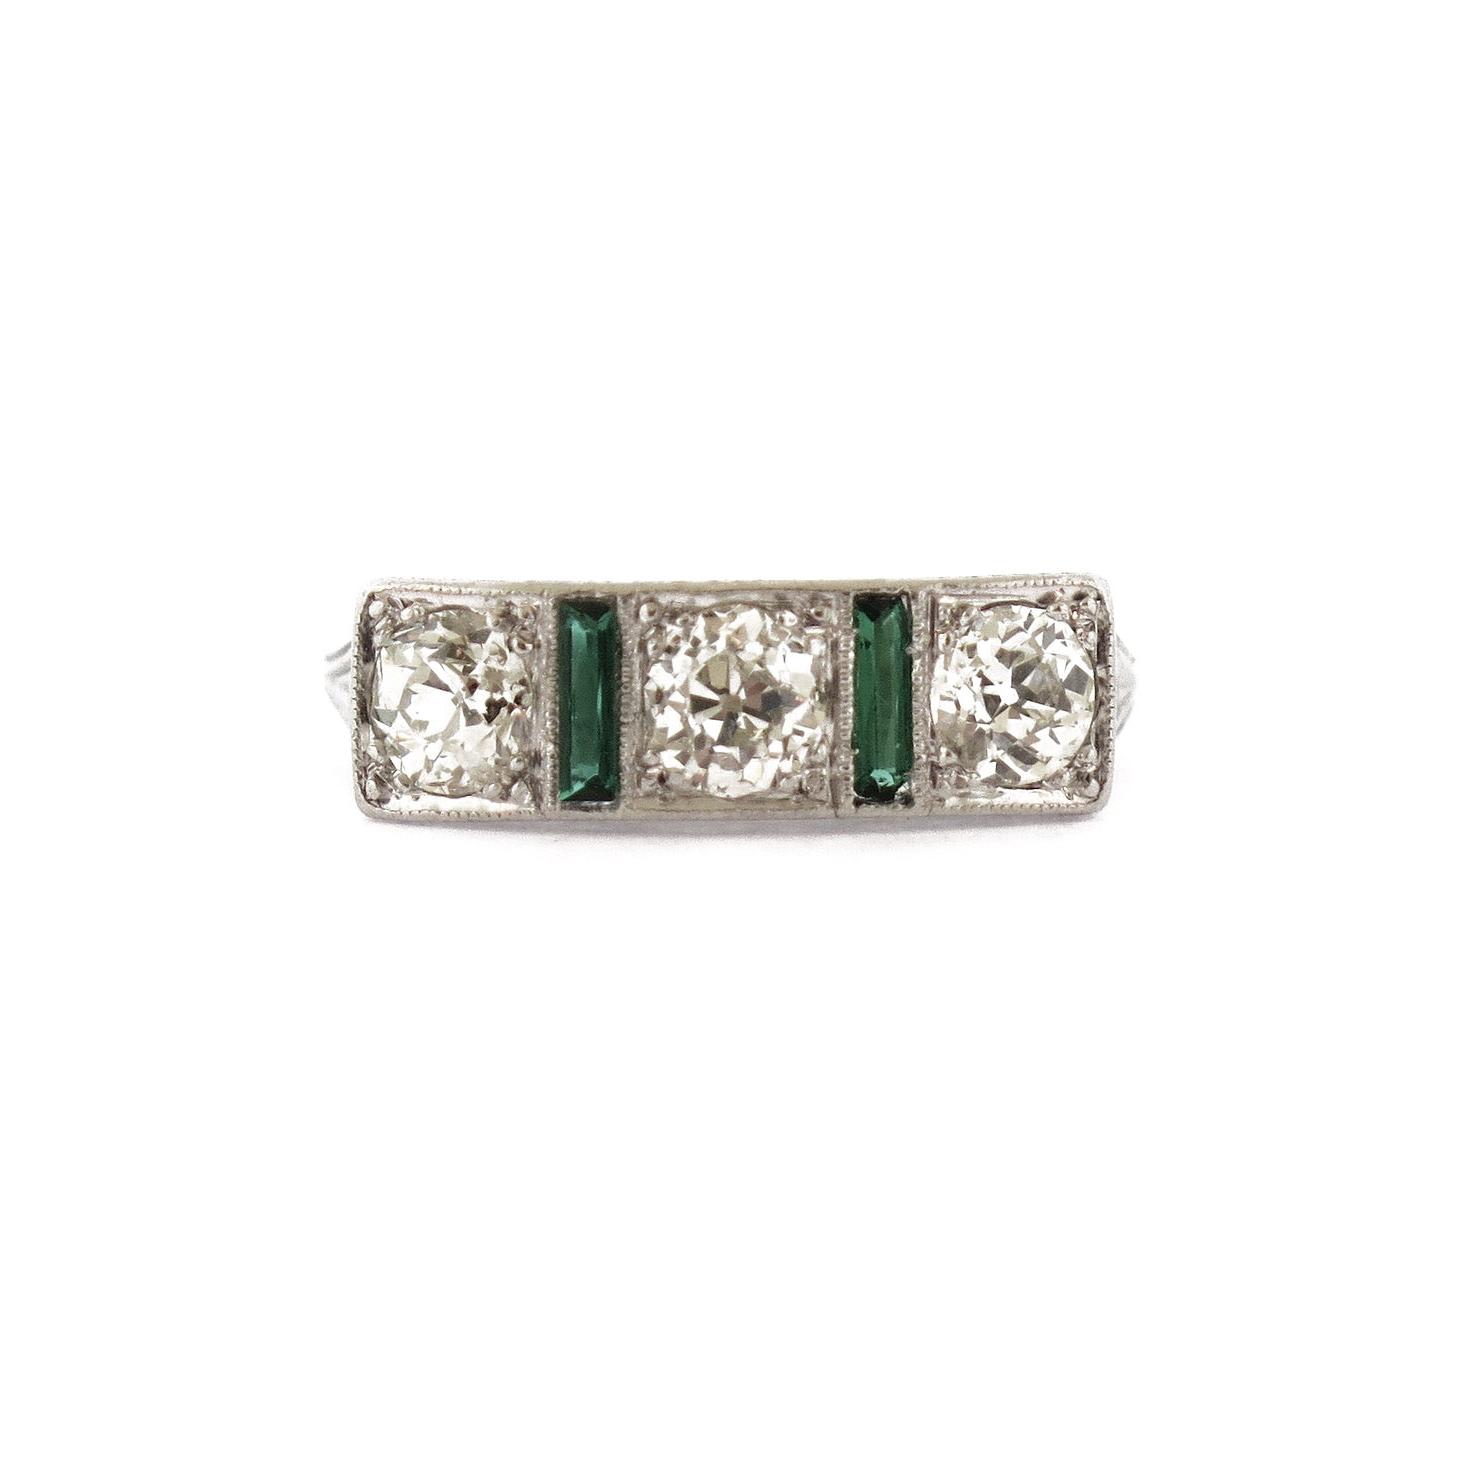 Edwardian Diamonds & Emerald Ring